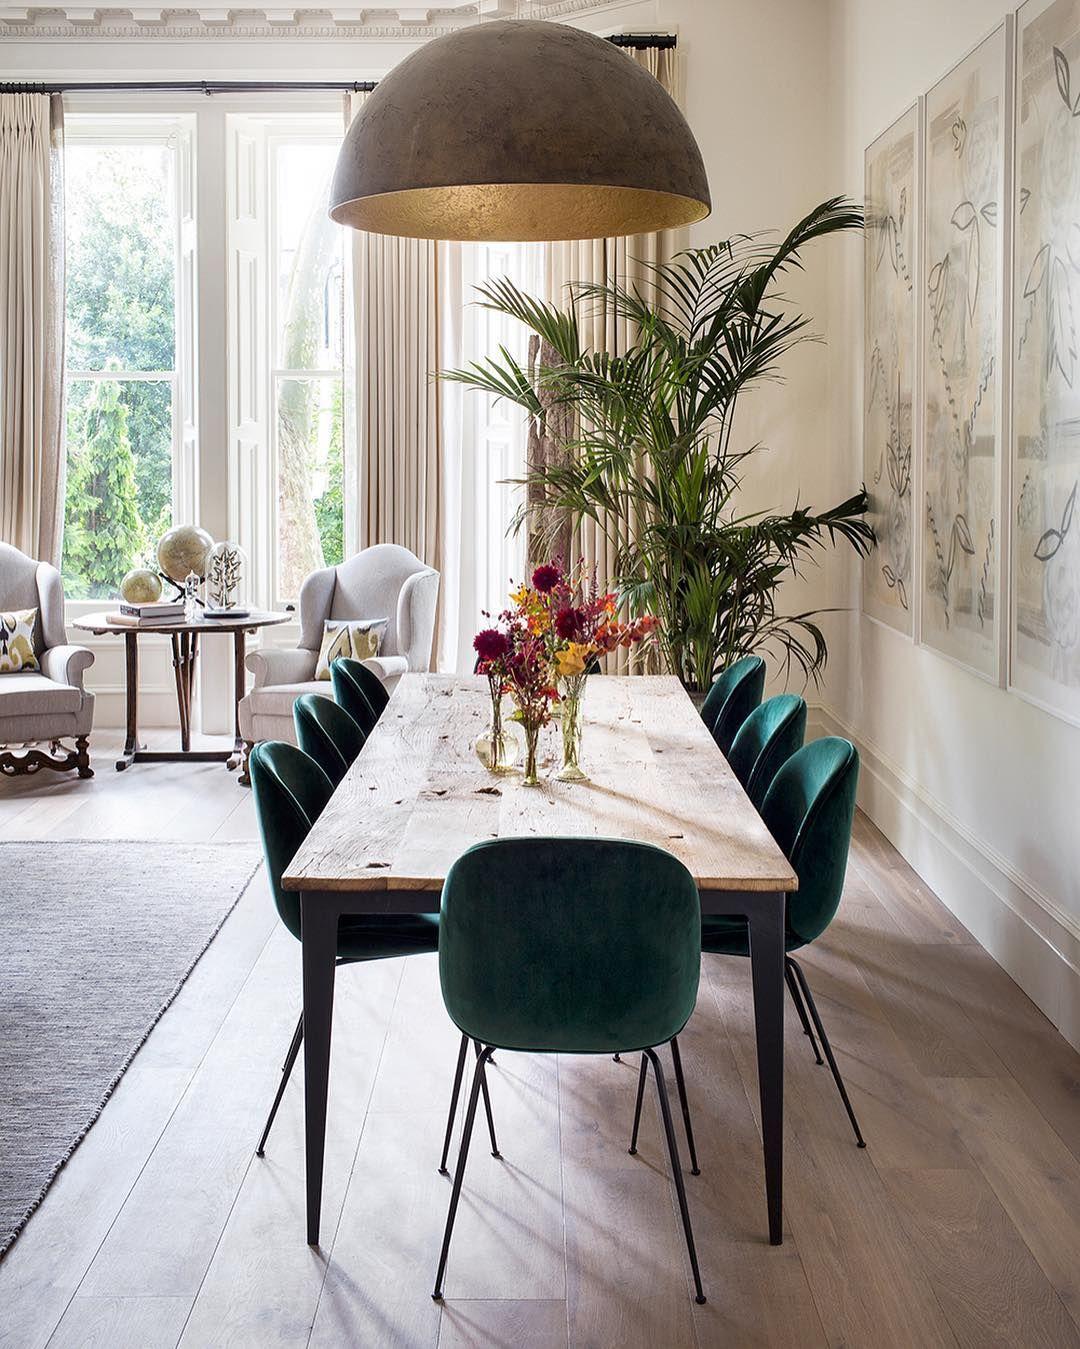 Pin de Mario mas Mel en Dining room / Comedor | Pinterest ...